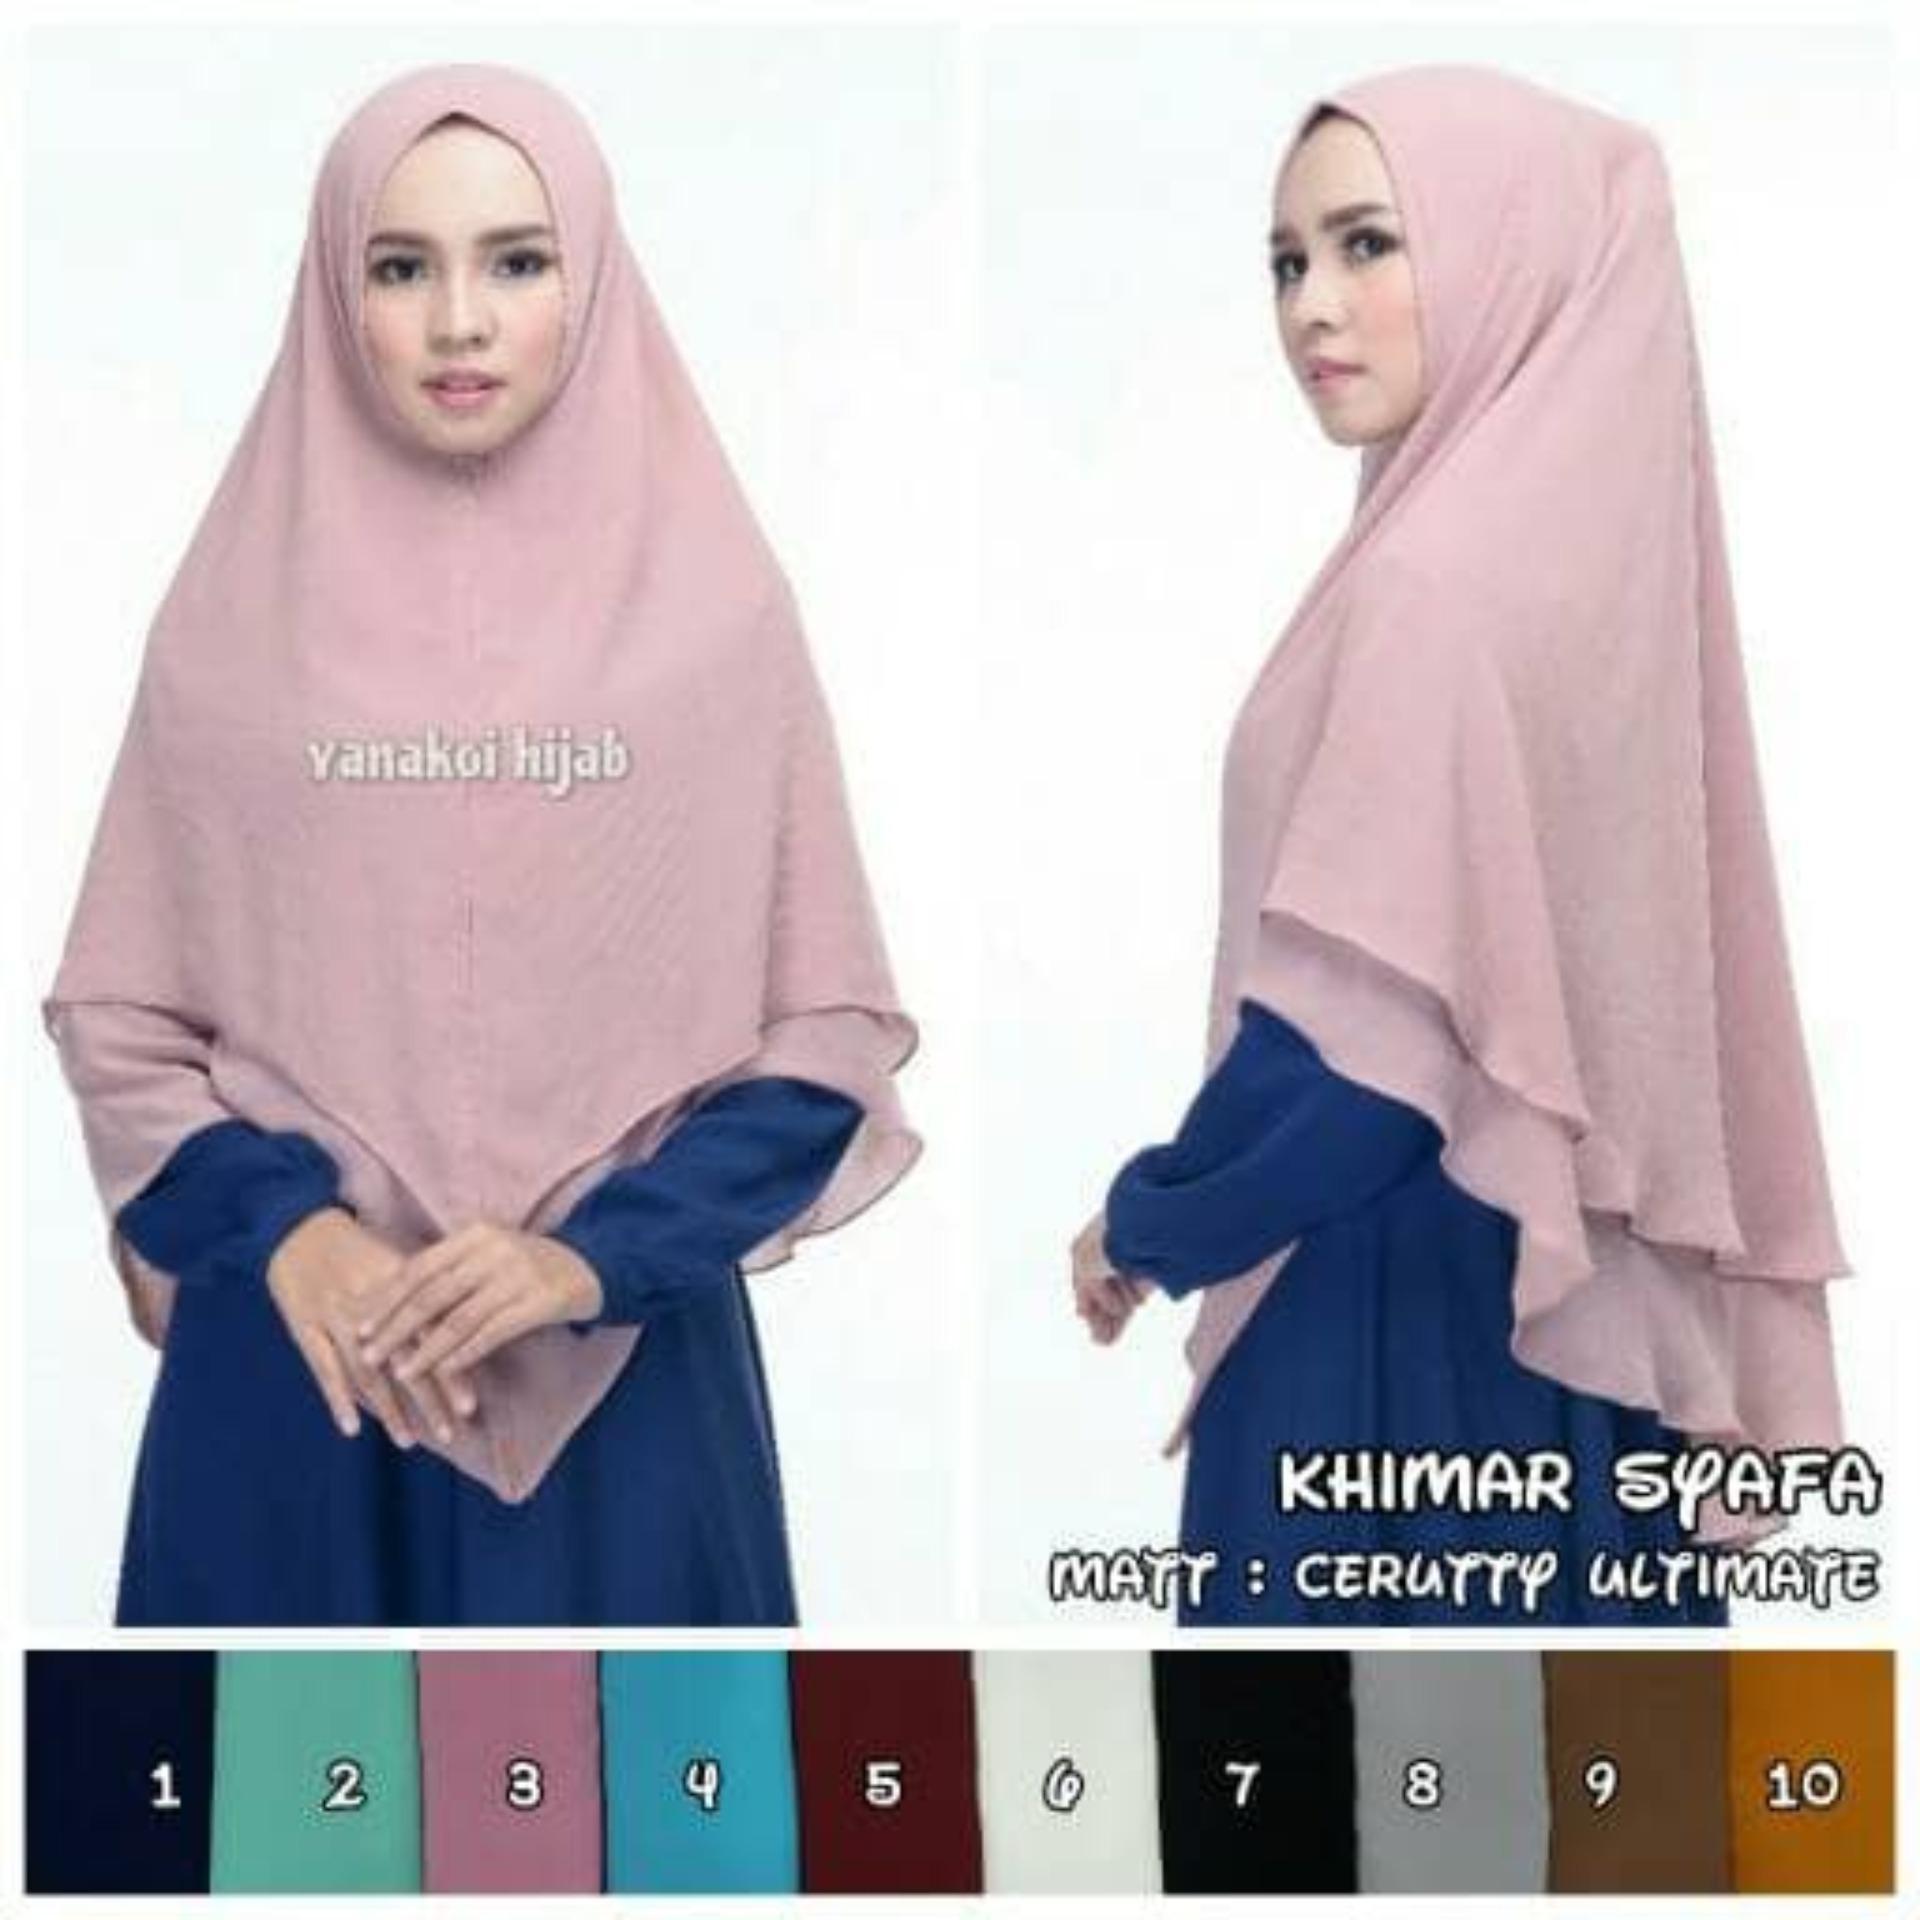 Jilbab Instan Khimar Syar'i Sabrina 3 Layer Hijab - Dusty Pink | Lazada Indonesia